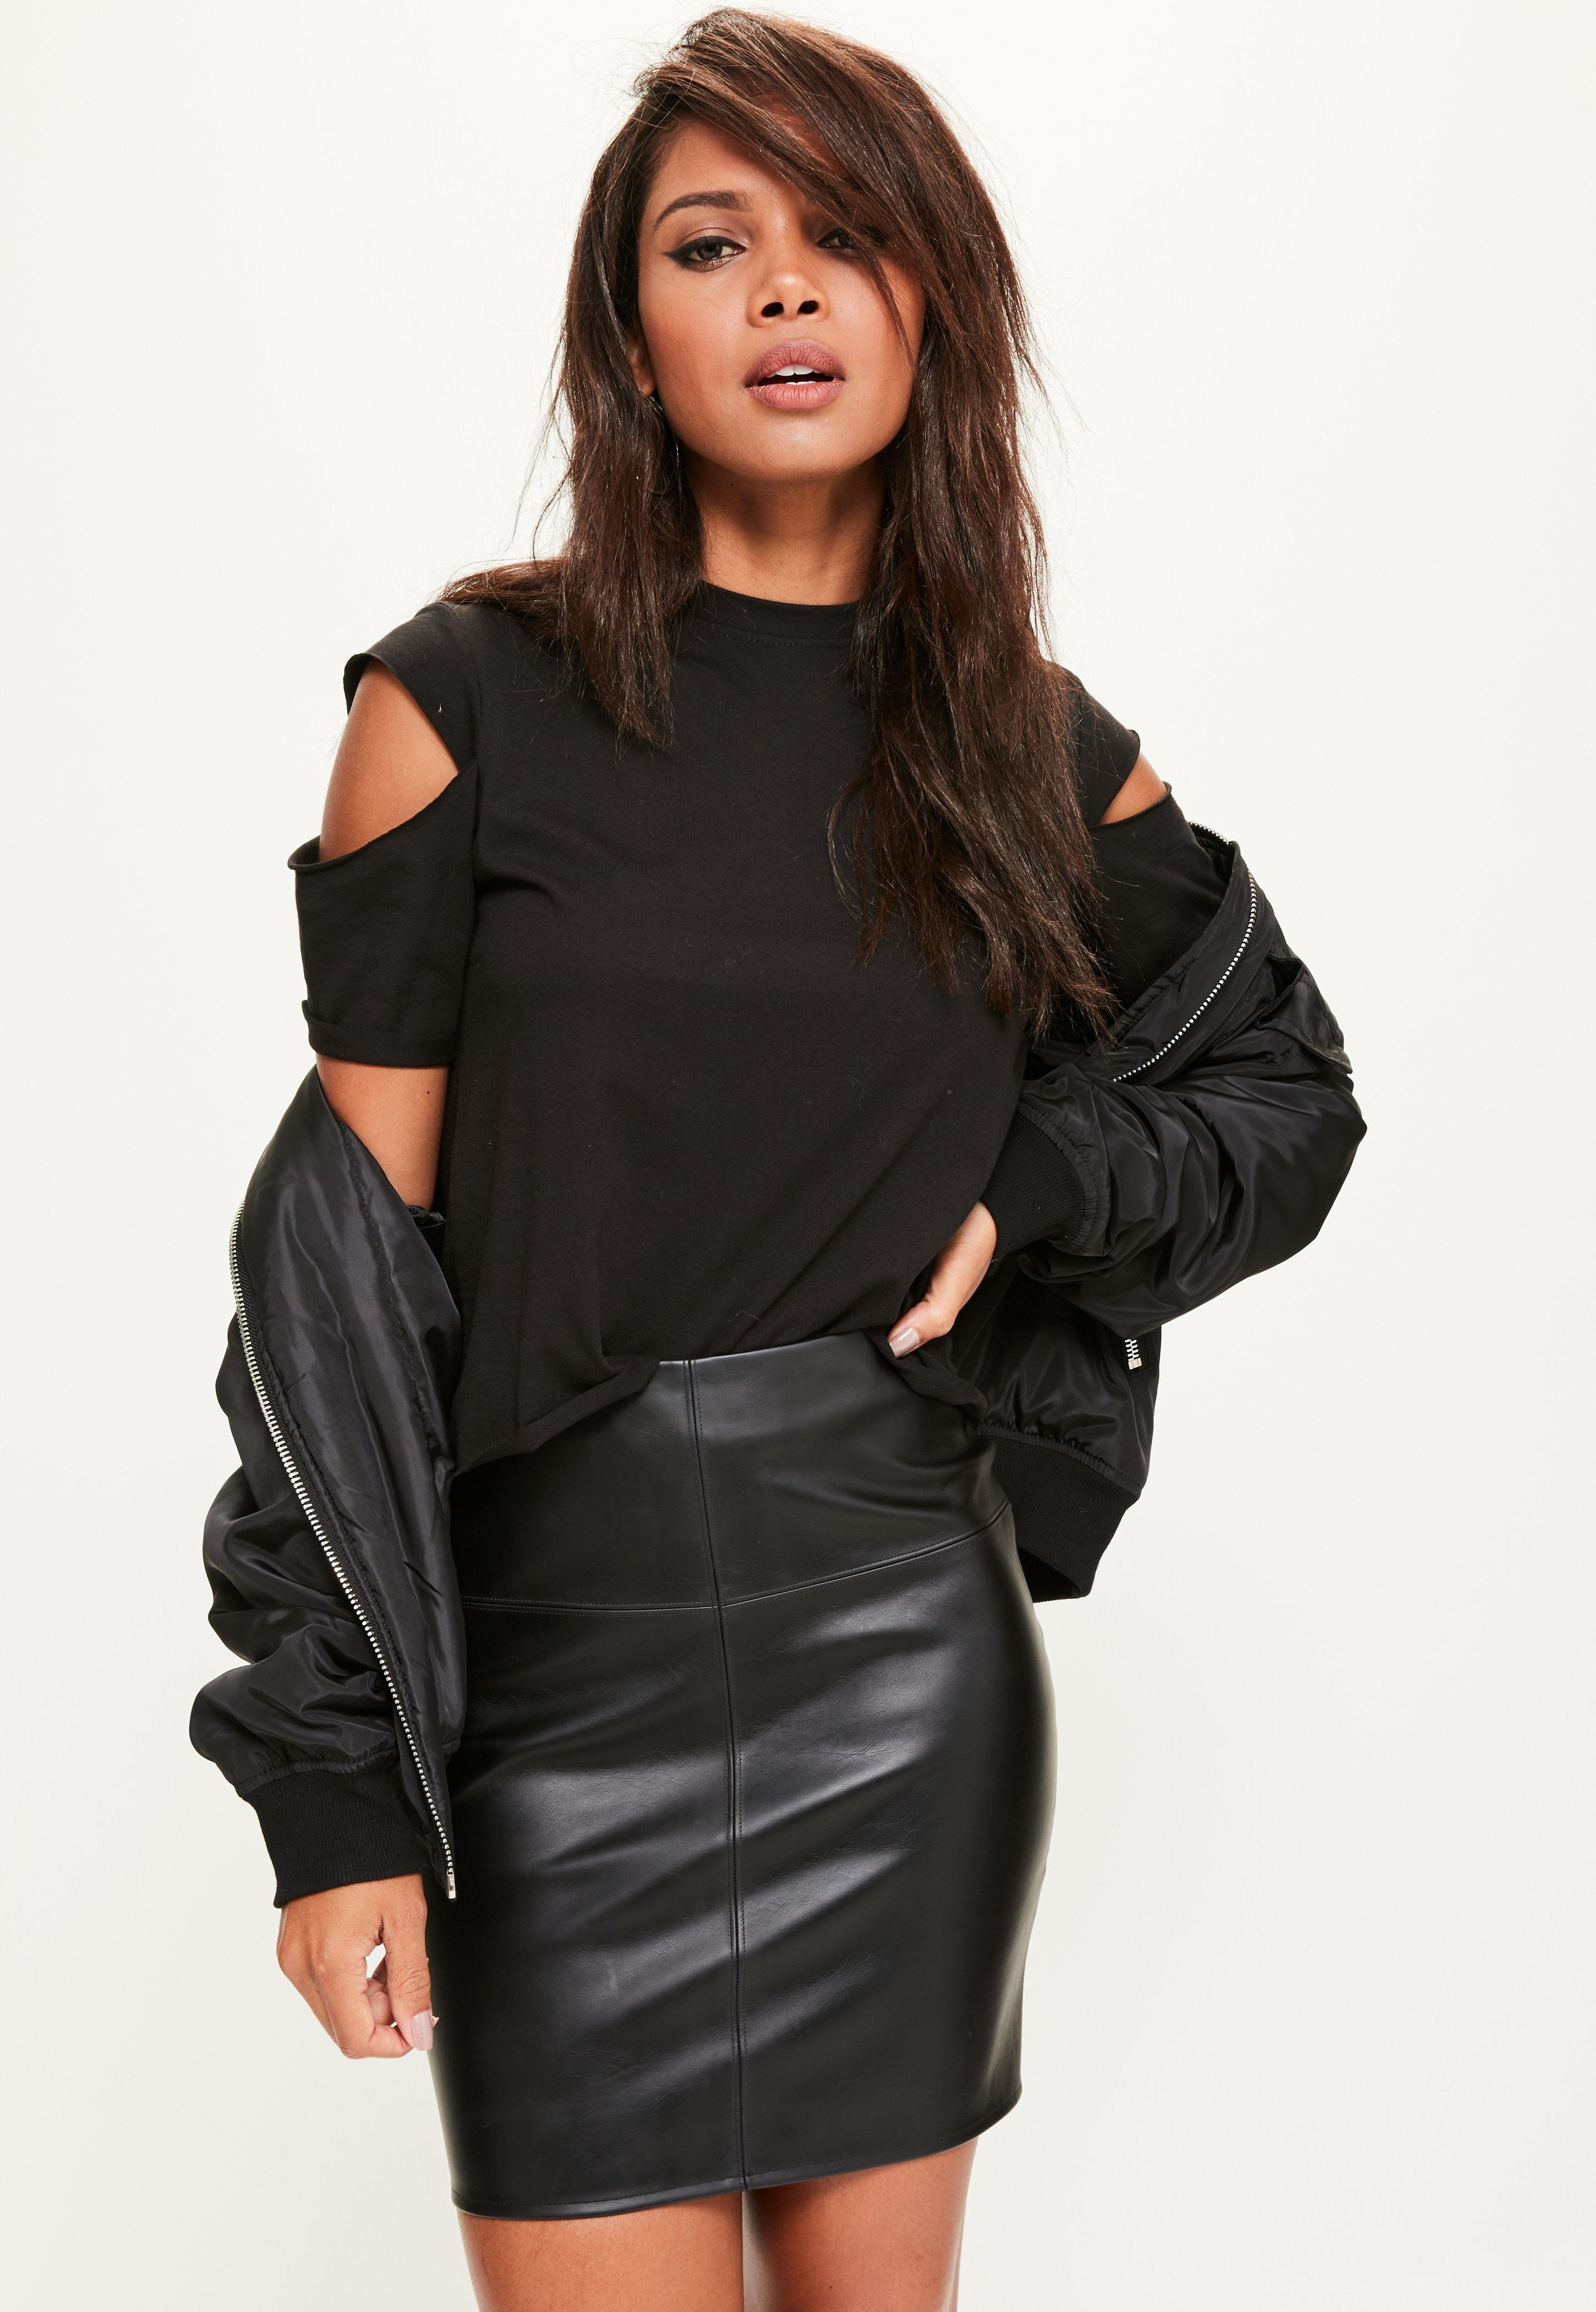 Bordeaux Leather Skirt | Faux Leather Skirt Plus Size | Faux Leather Skirt